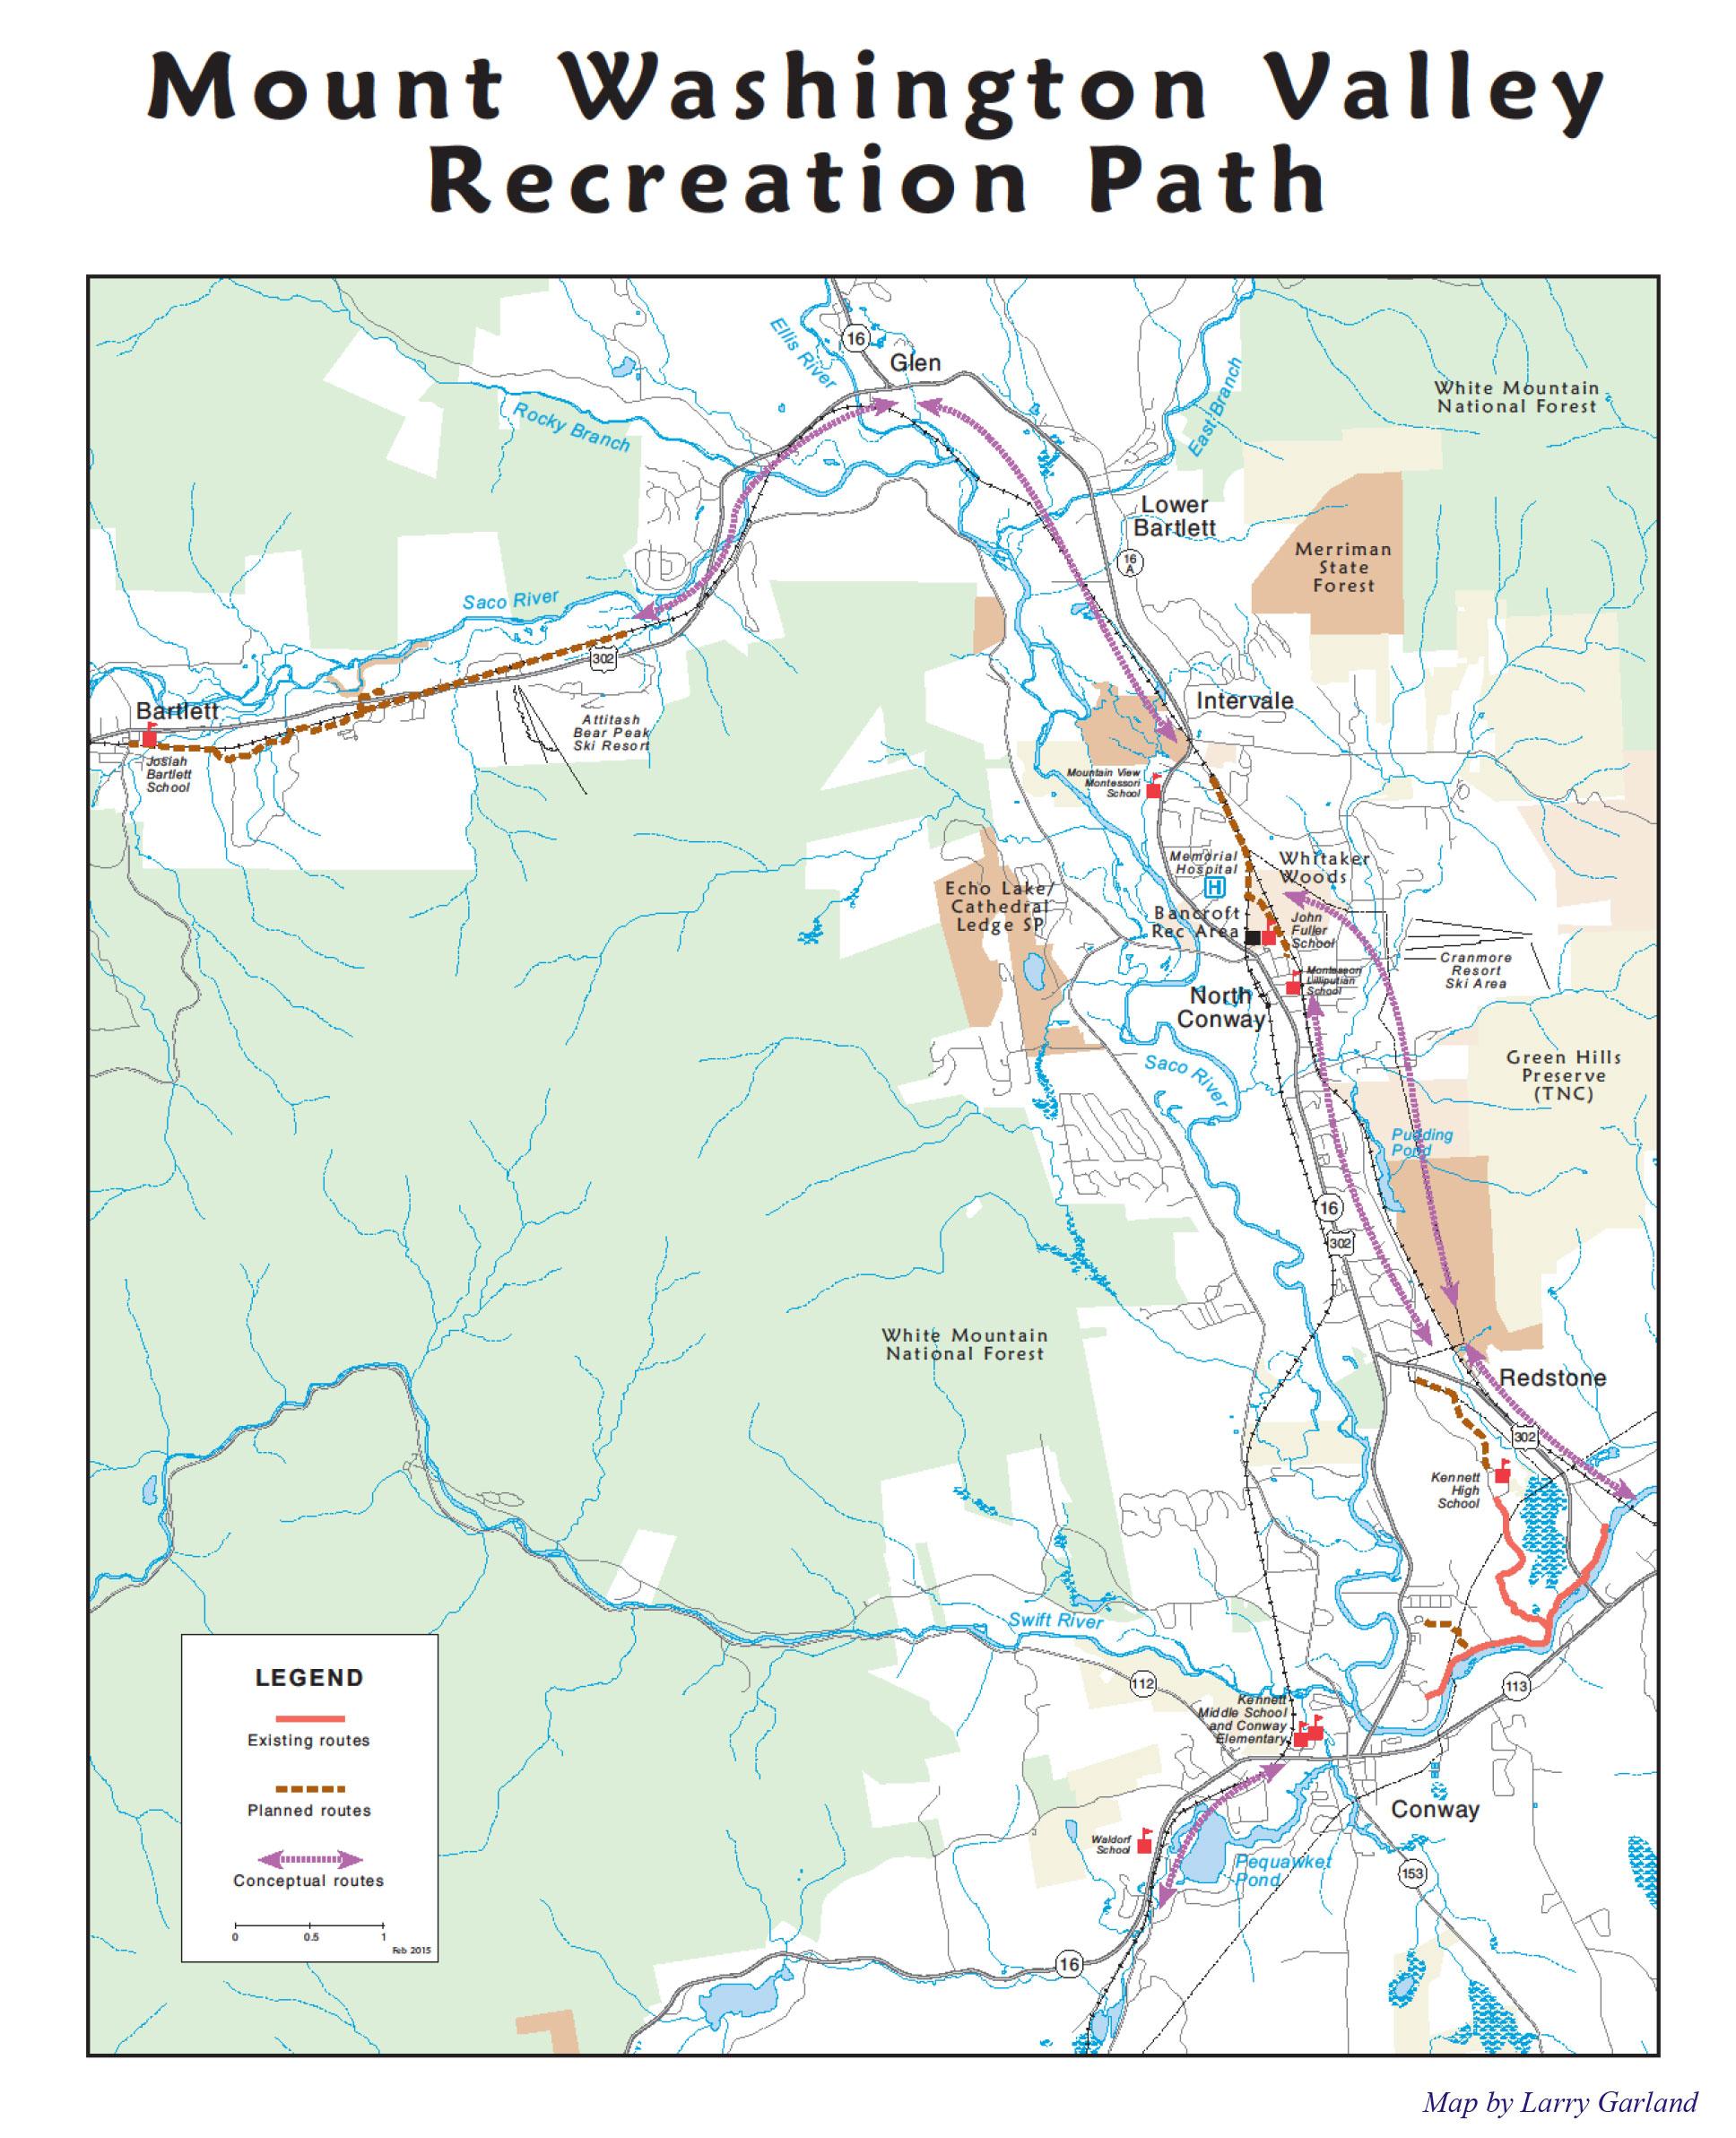 Map - Mount Washington Valley Recreation Path   North Conway NH Map North Conway Nh on north portland oregon map, hampton nh map, attitash nh map, wolfeboro nh map, baker river nh map, plymouth nh map, nh new hampshire state map, north conway new hampshire, presidential range nh map, tamworth nh map, north conway hotels, portsmouth nh map, littleton nh map, lincoln nh map, nashua nh map, keene nh map, northwood nh map, jackson nh map, mount washington nh map, white mountains nh map,